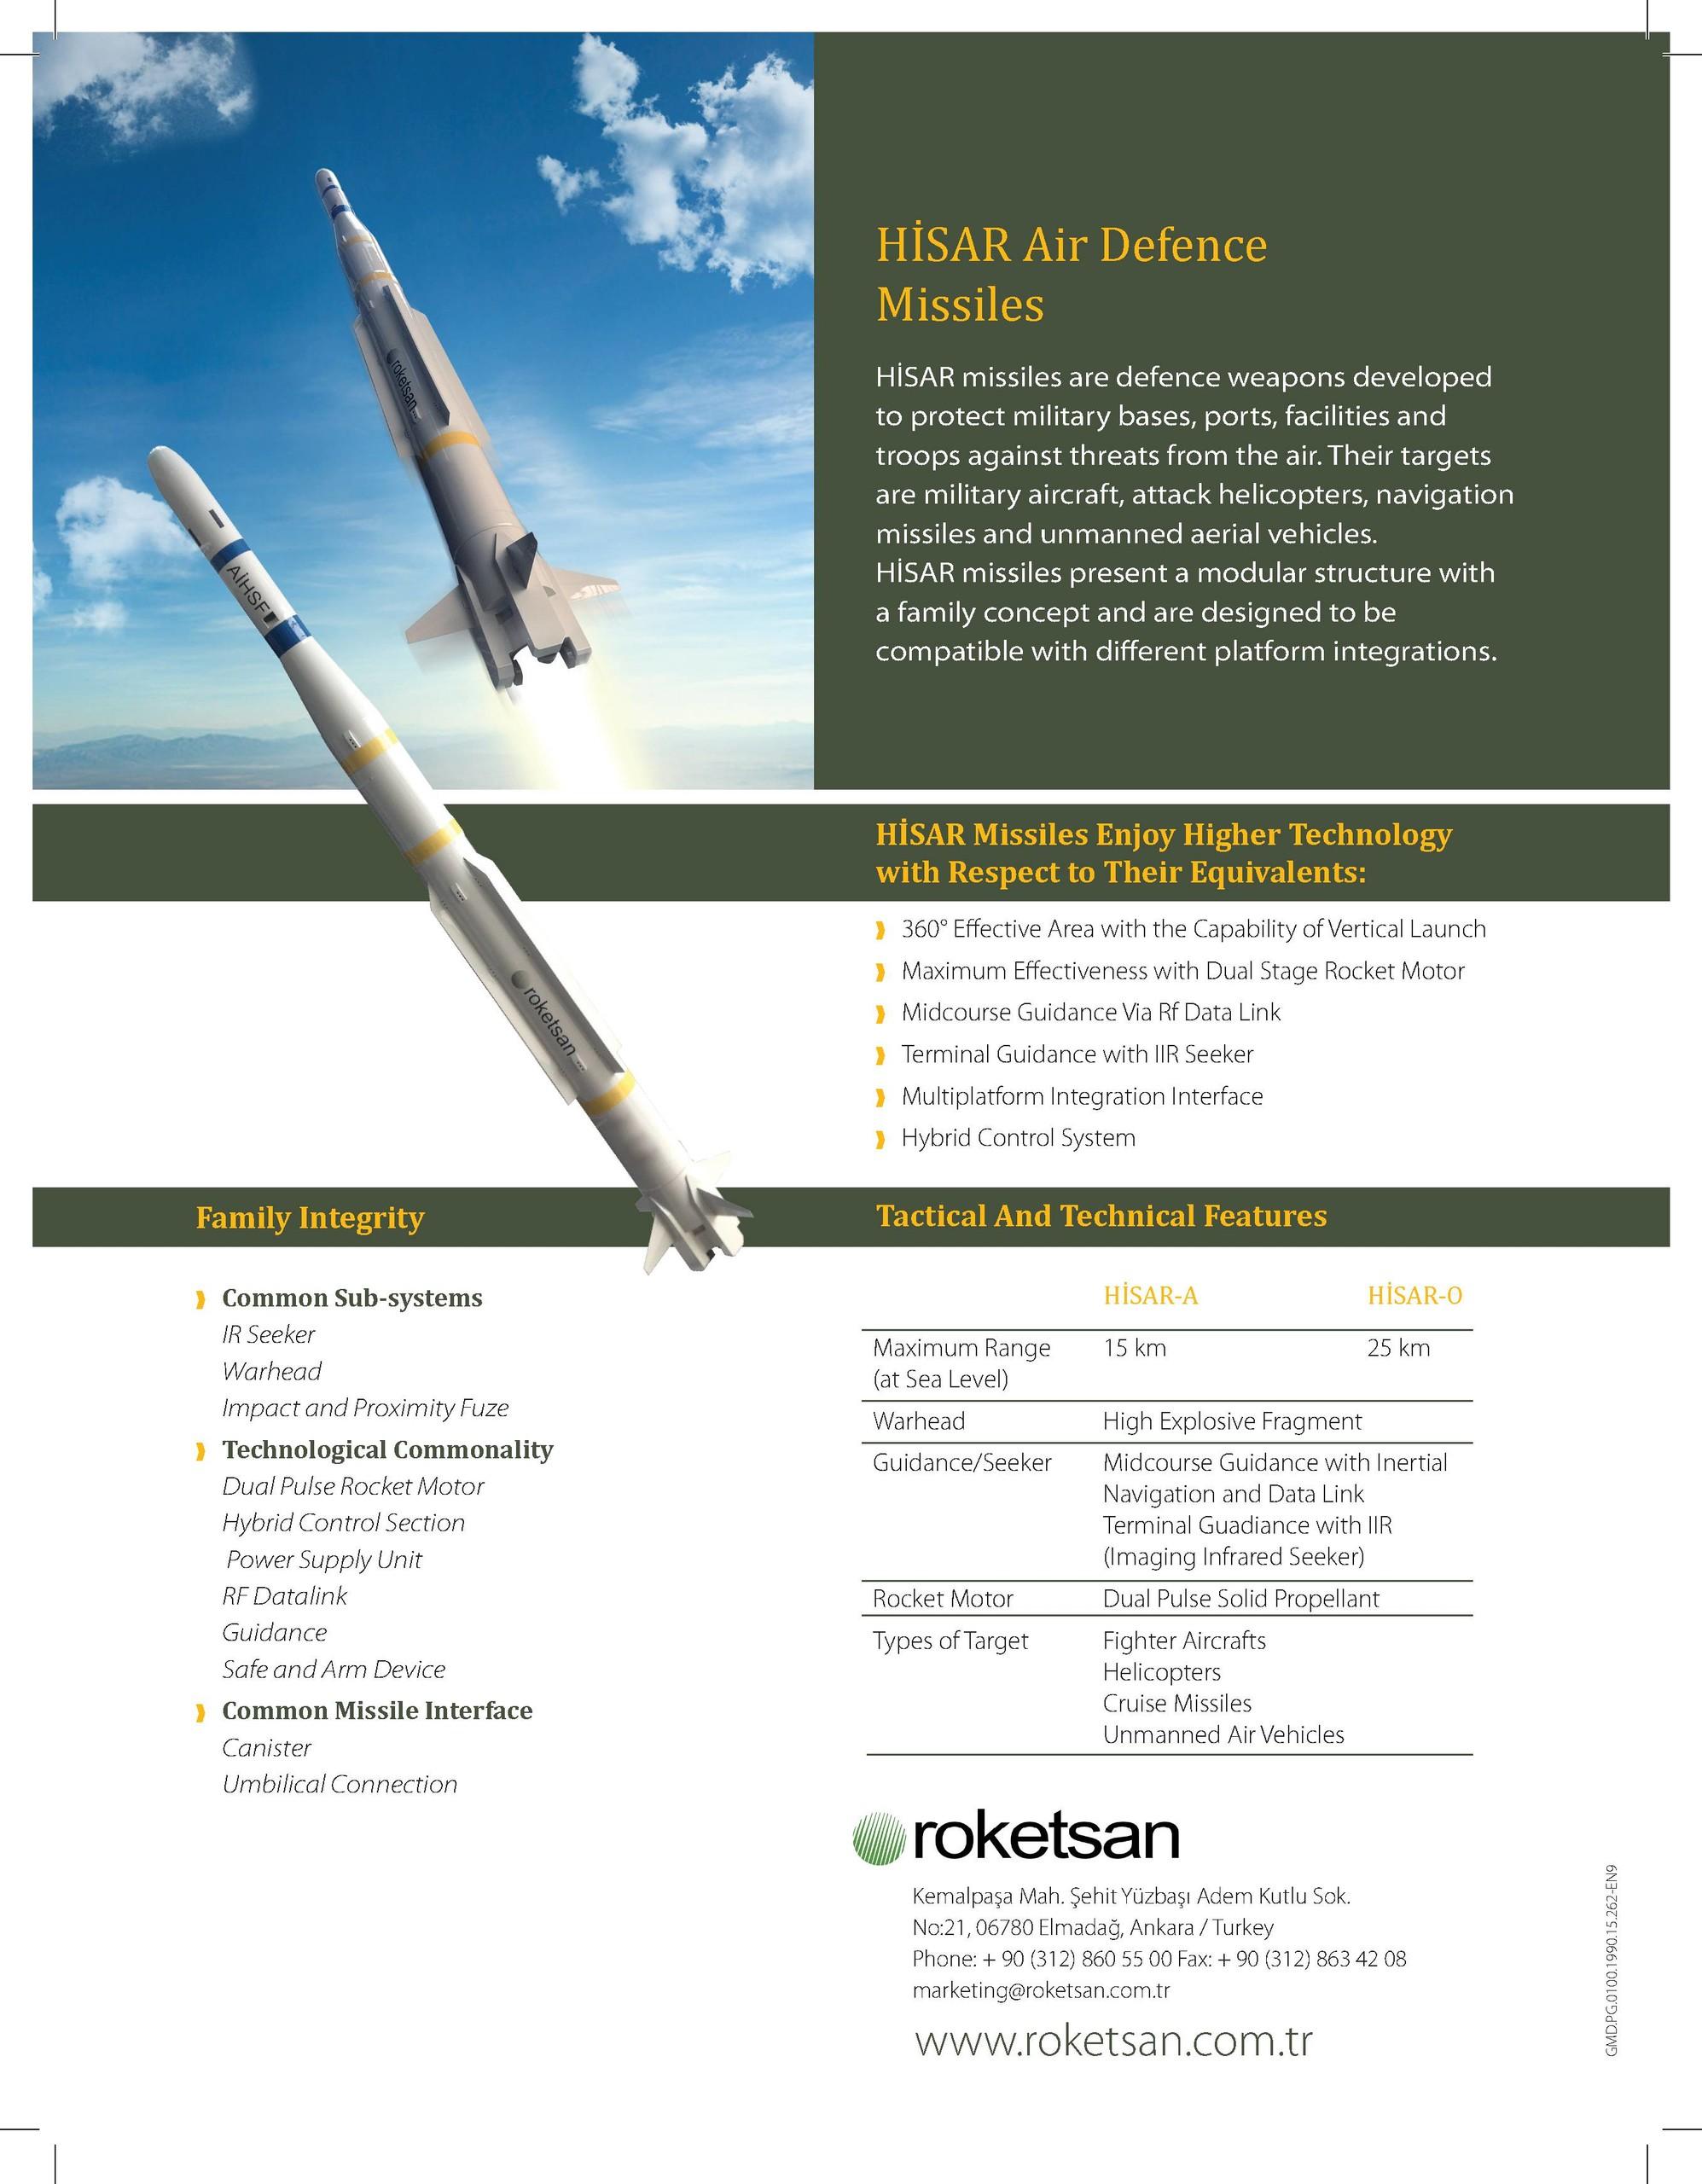 Turkey Defense Industry Projects PQmb69